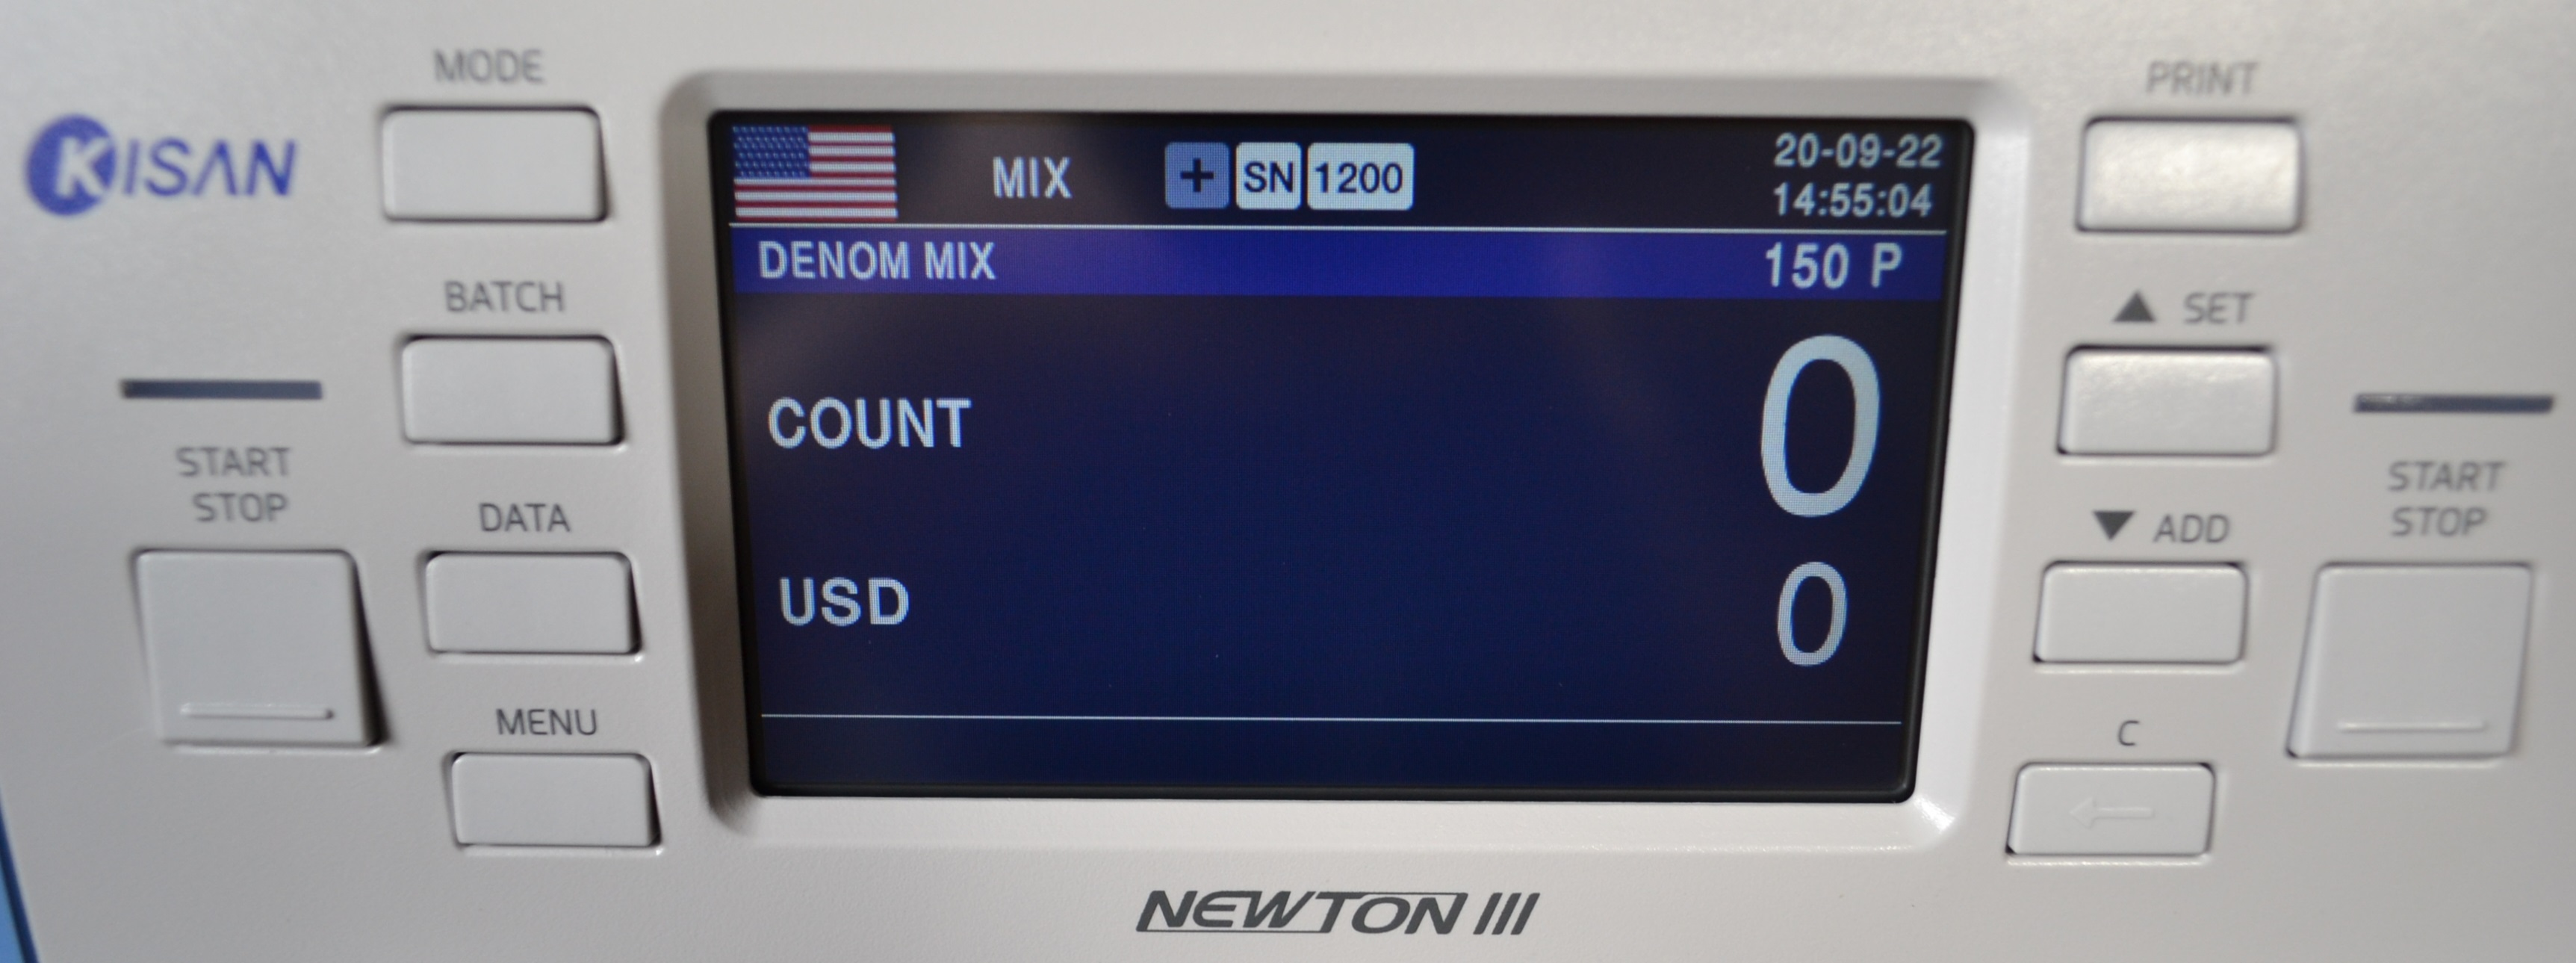 Newton_III_Screen